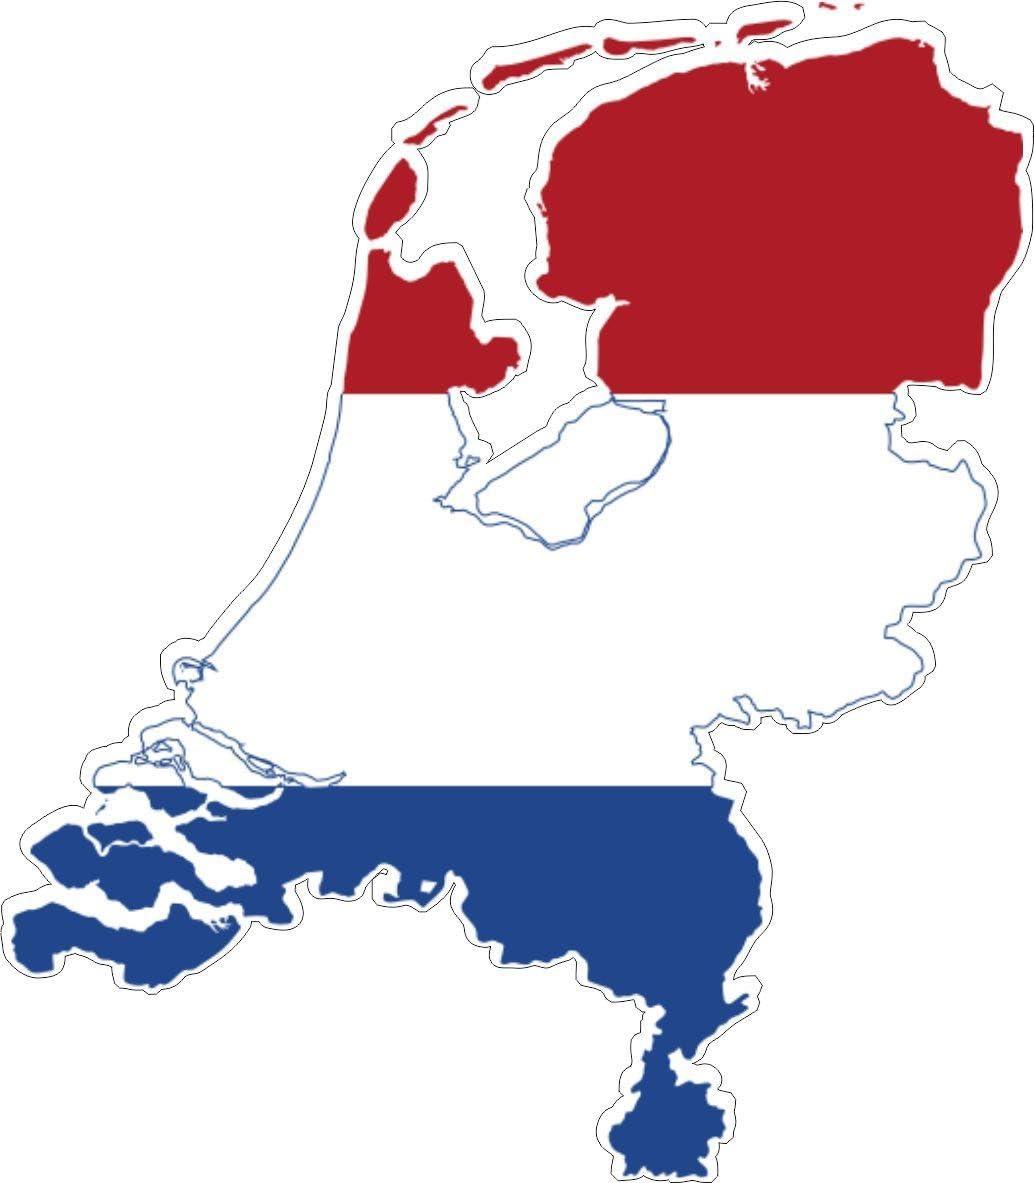 Akachafactory Selbstklebend Wandtattoo Sticker Auto Vinyl Flagge Karte Land Unten Holland Auto